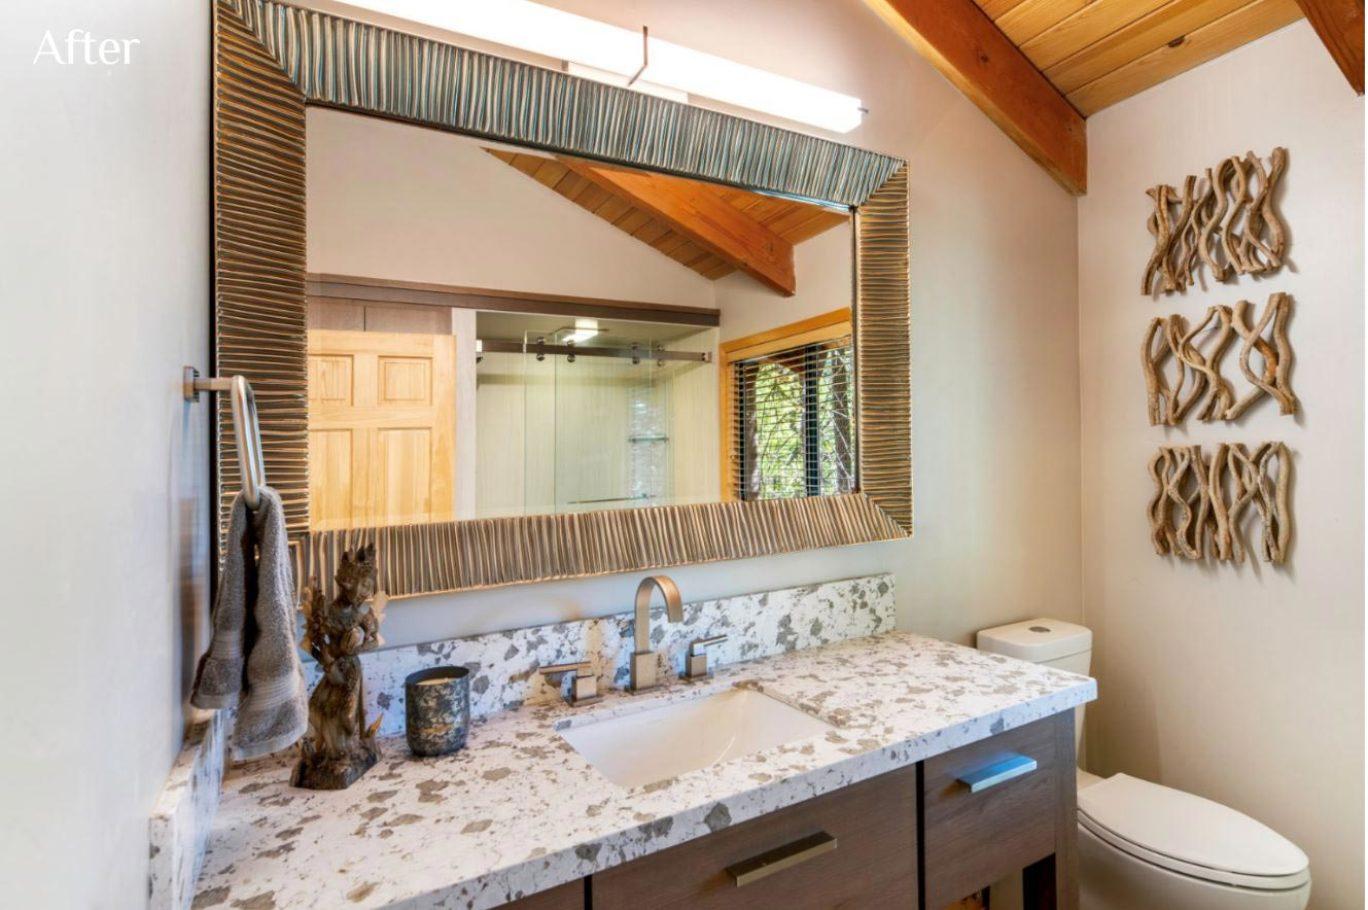 Bathroom Design after Talie Jane Interiors